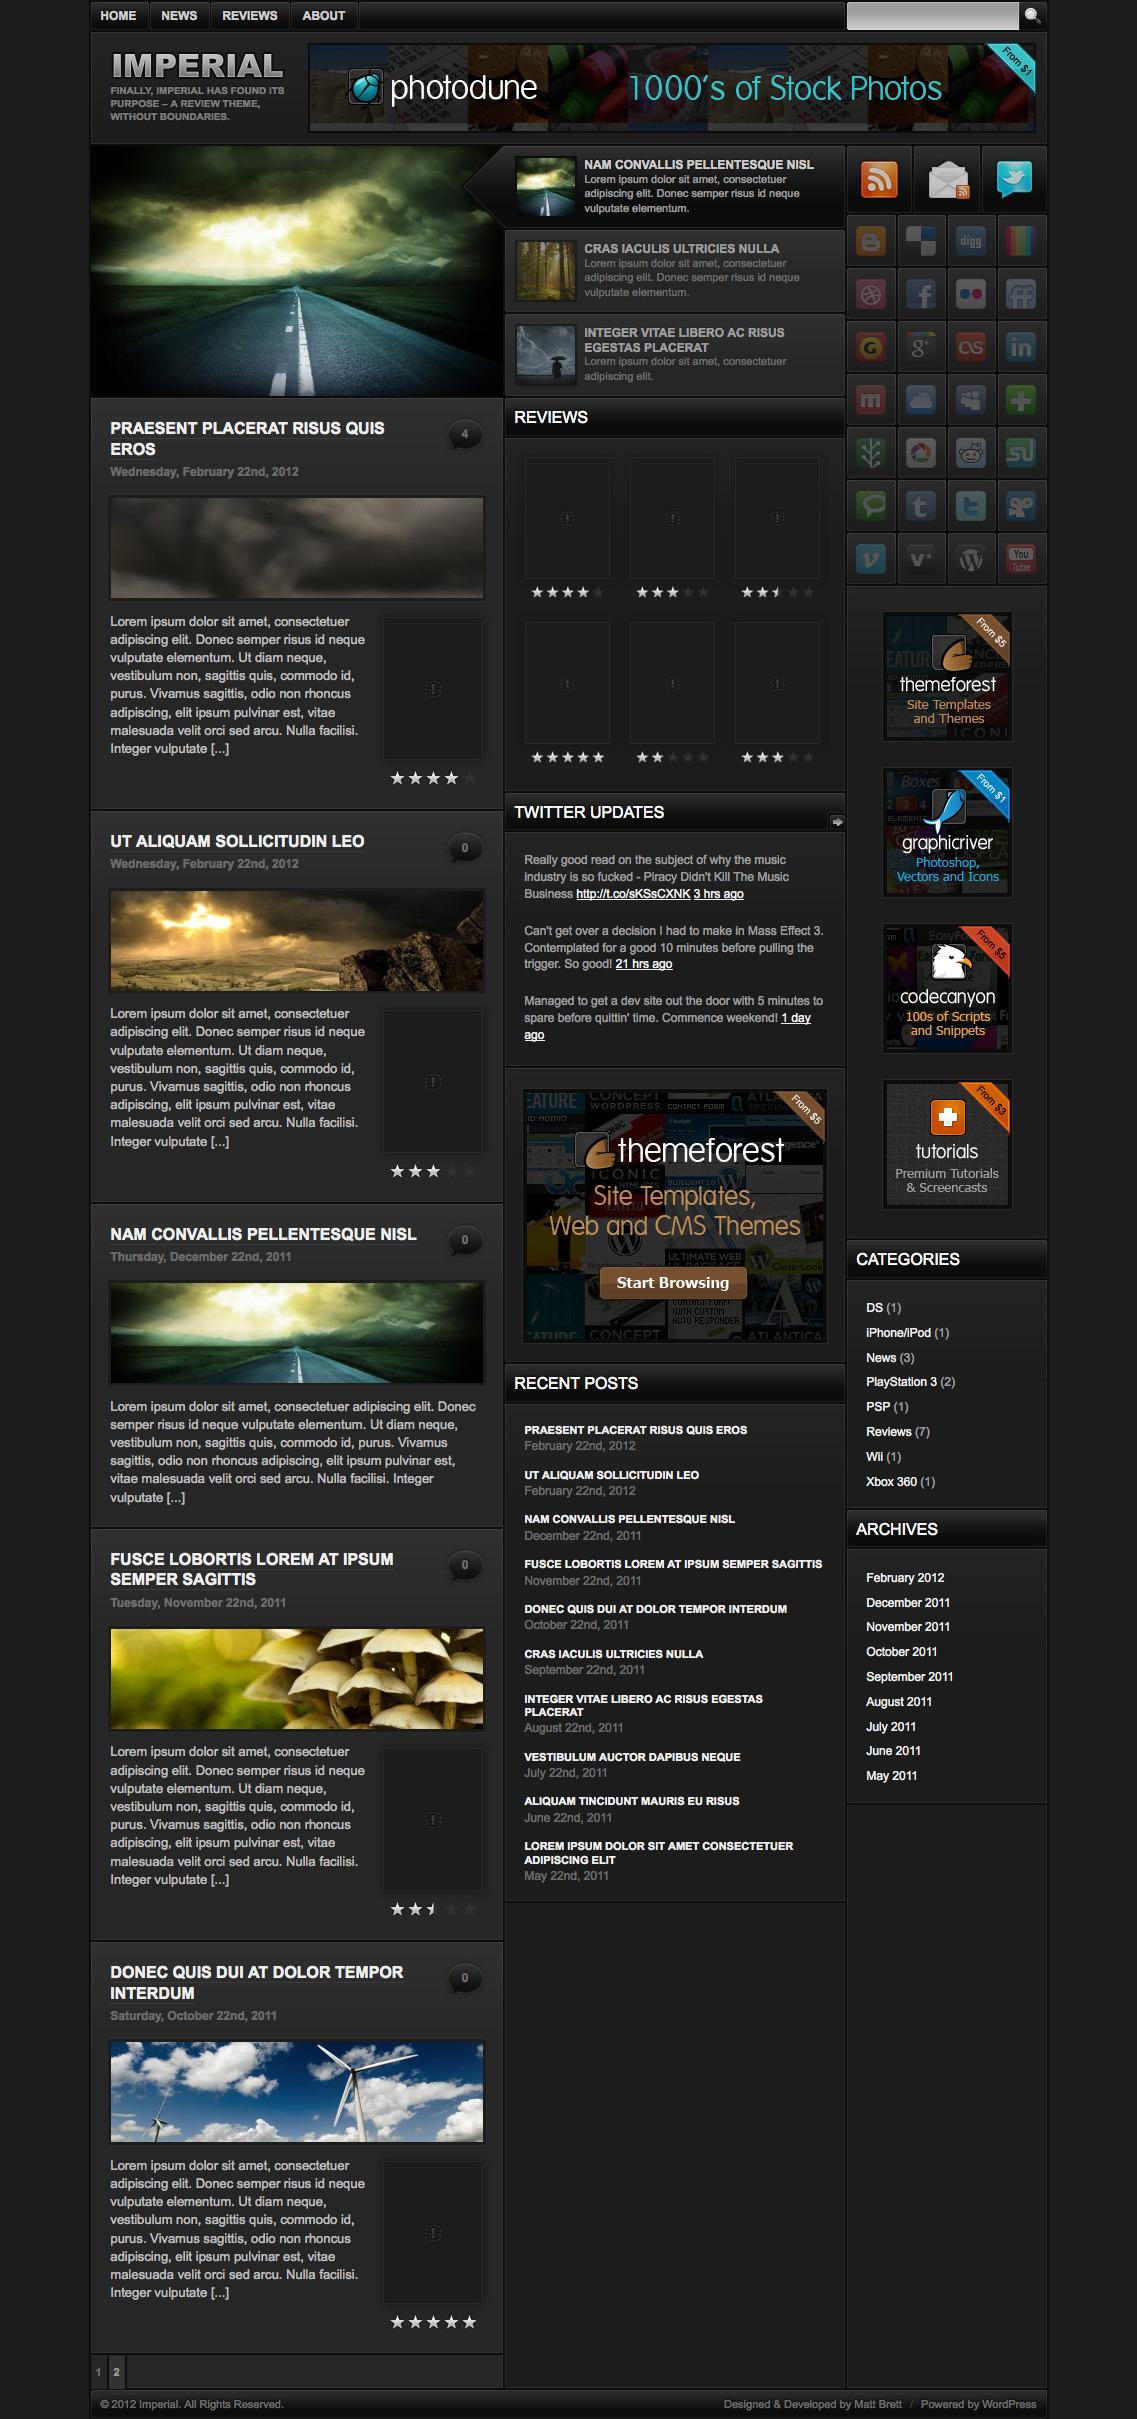 http://1.s3.envato.com/files/38290819/screenshots/02_homepage.jpg